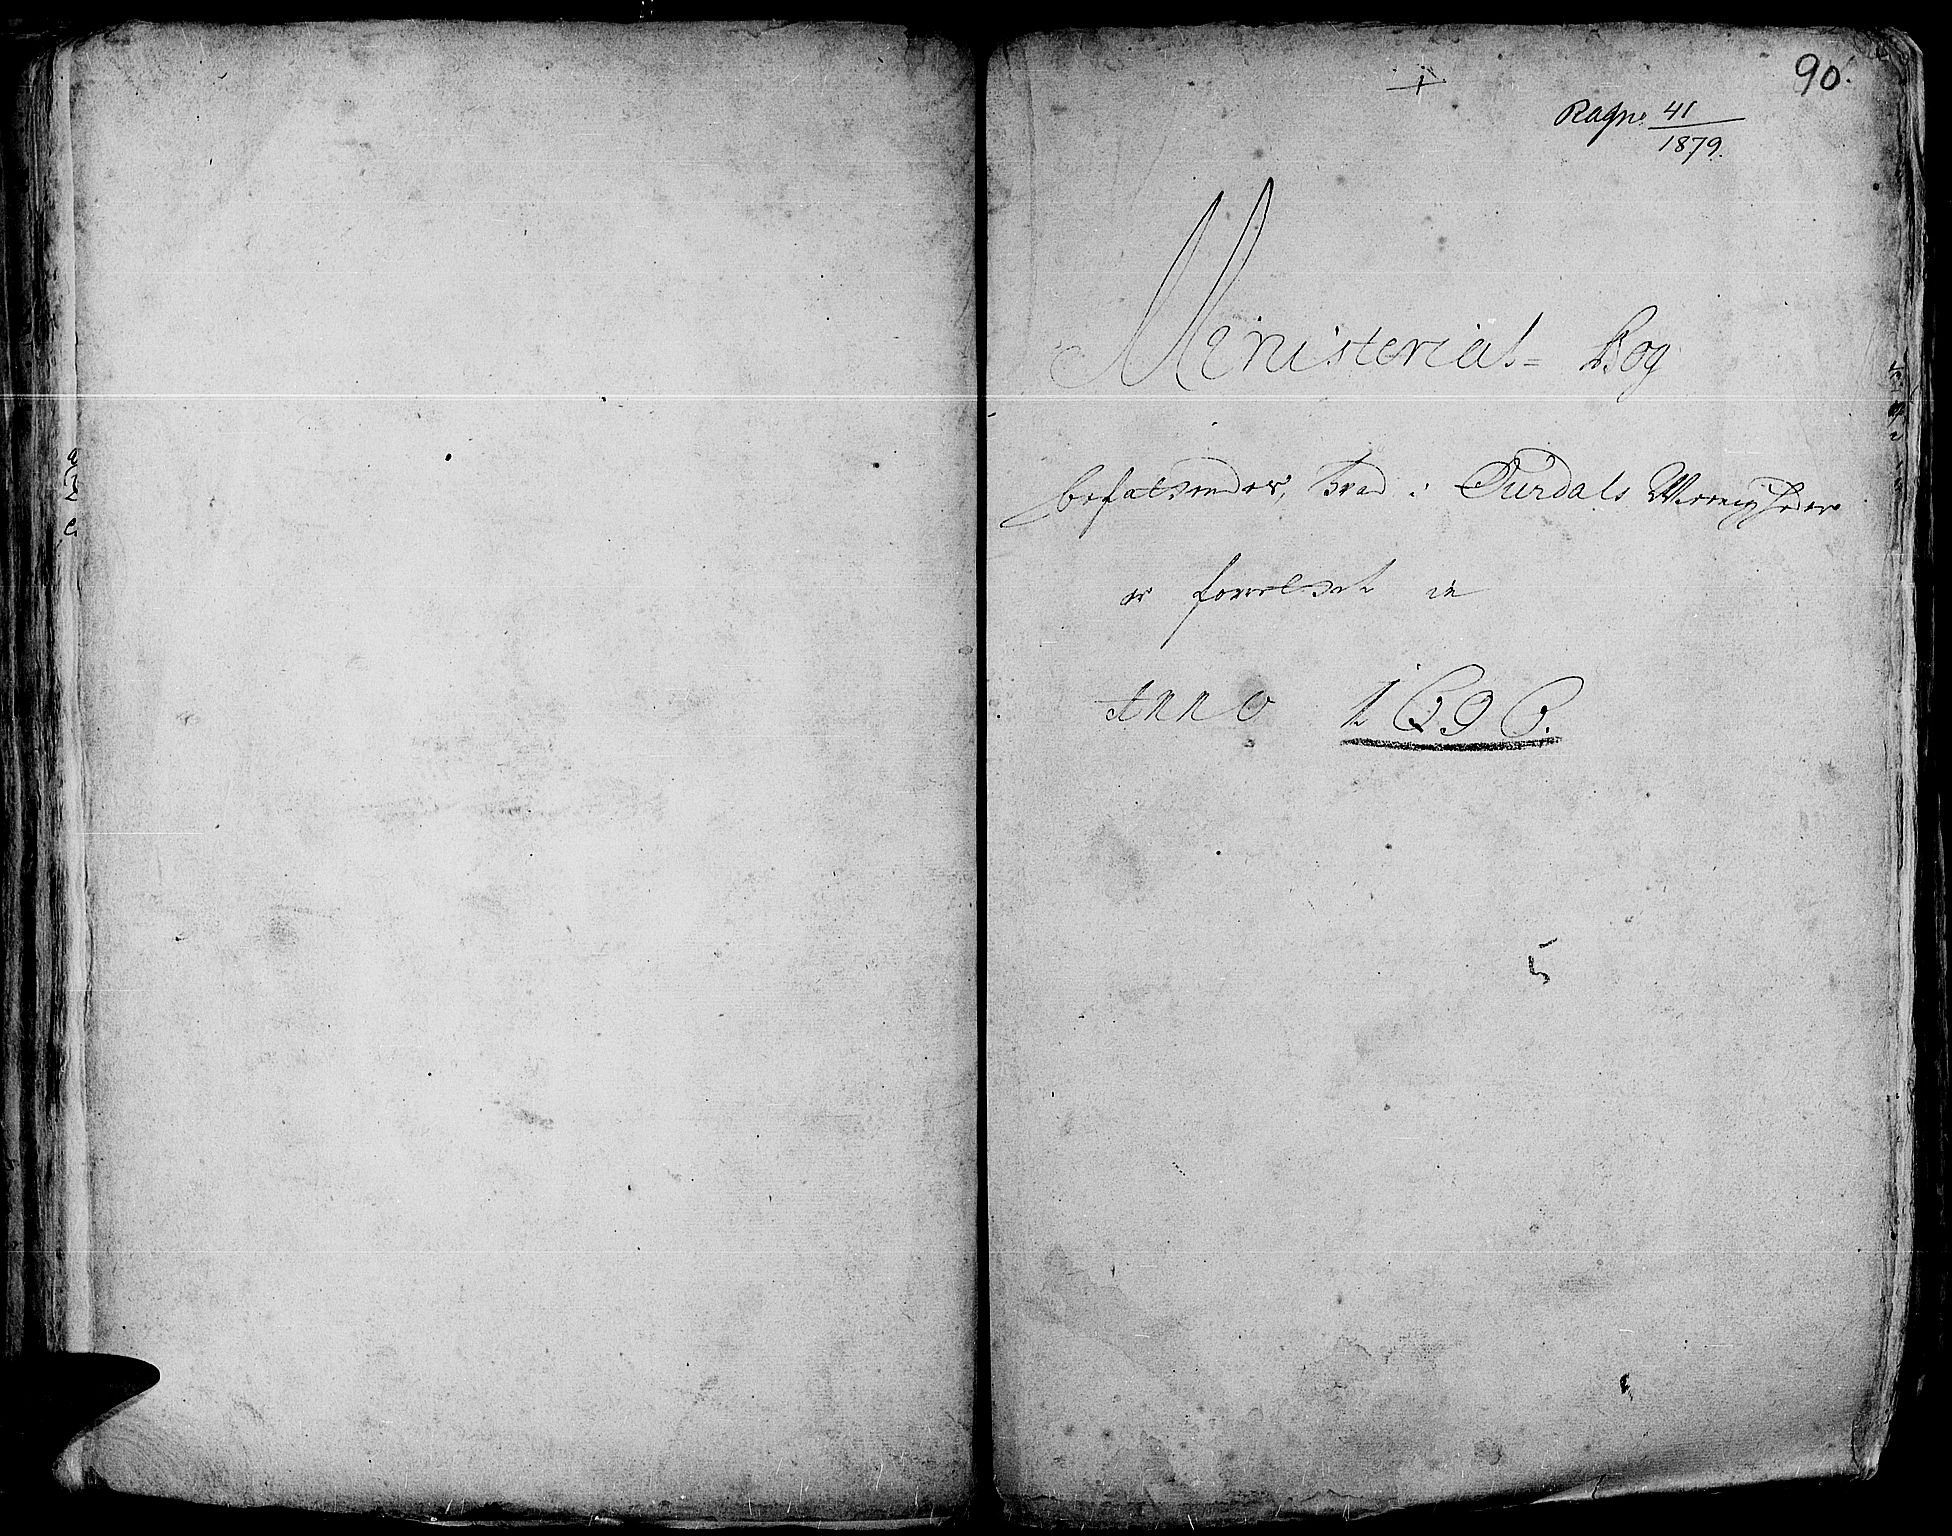 SAH, Aurdal prestekontor, Ministerialbok nr. 1-3, 1692-1730, s. 90